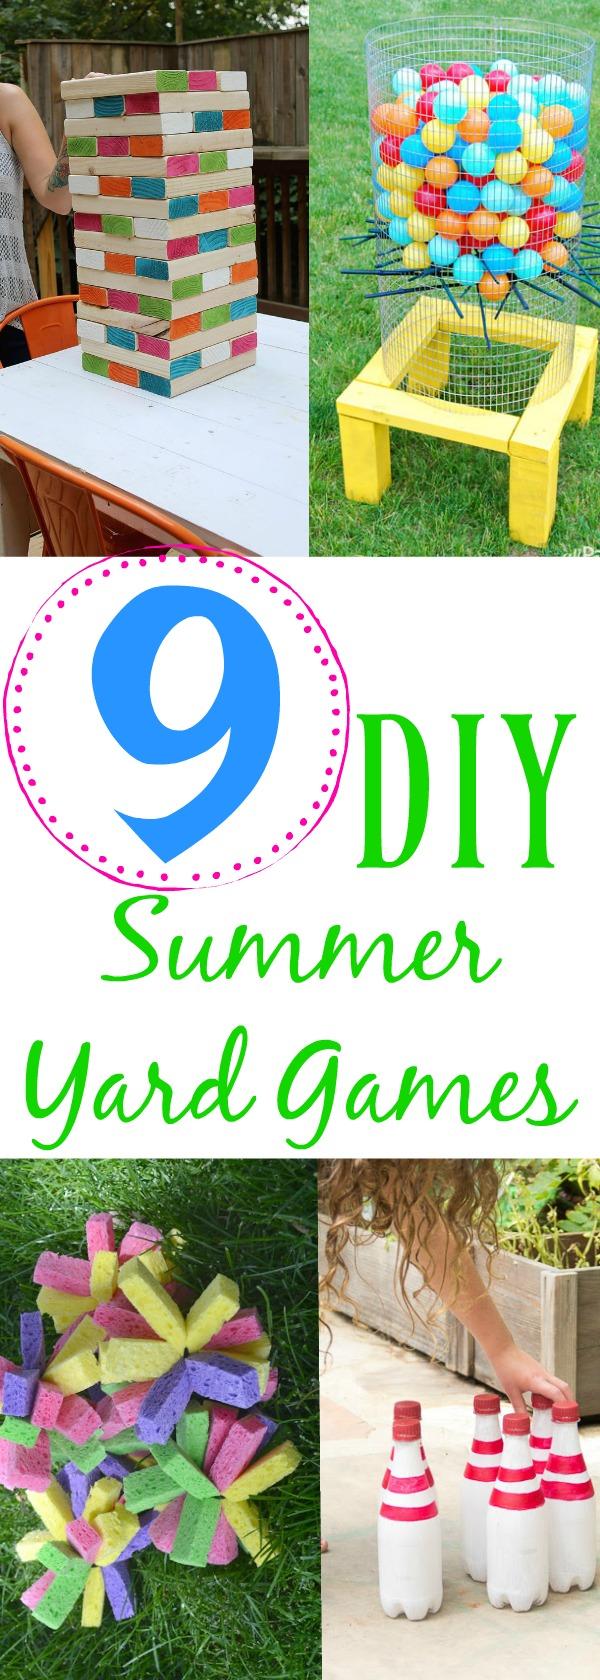 9 diy summer yard games, make your own outdoor games, DIY outdoor games, DIY yard games for kids, DIY yard games, fun games for the backyard, backyard games, backyard DIY games